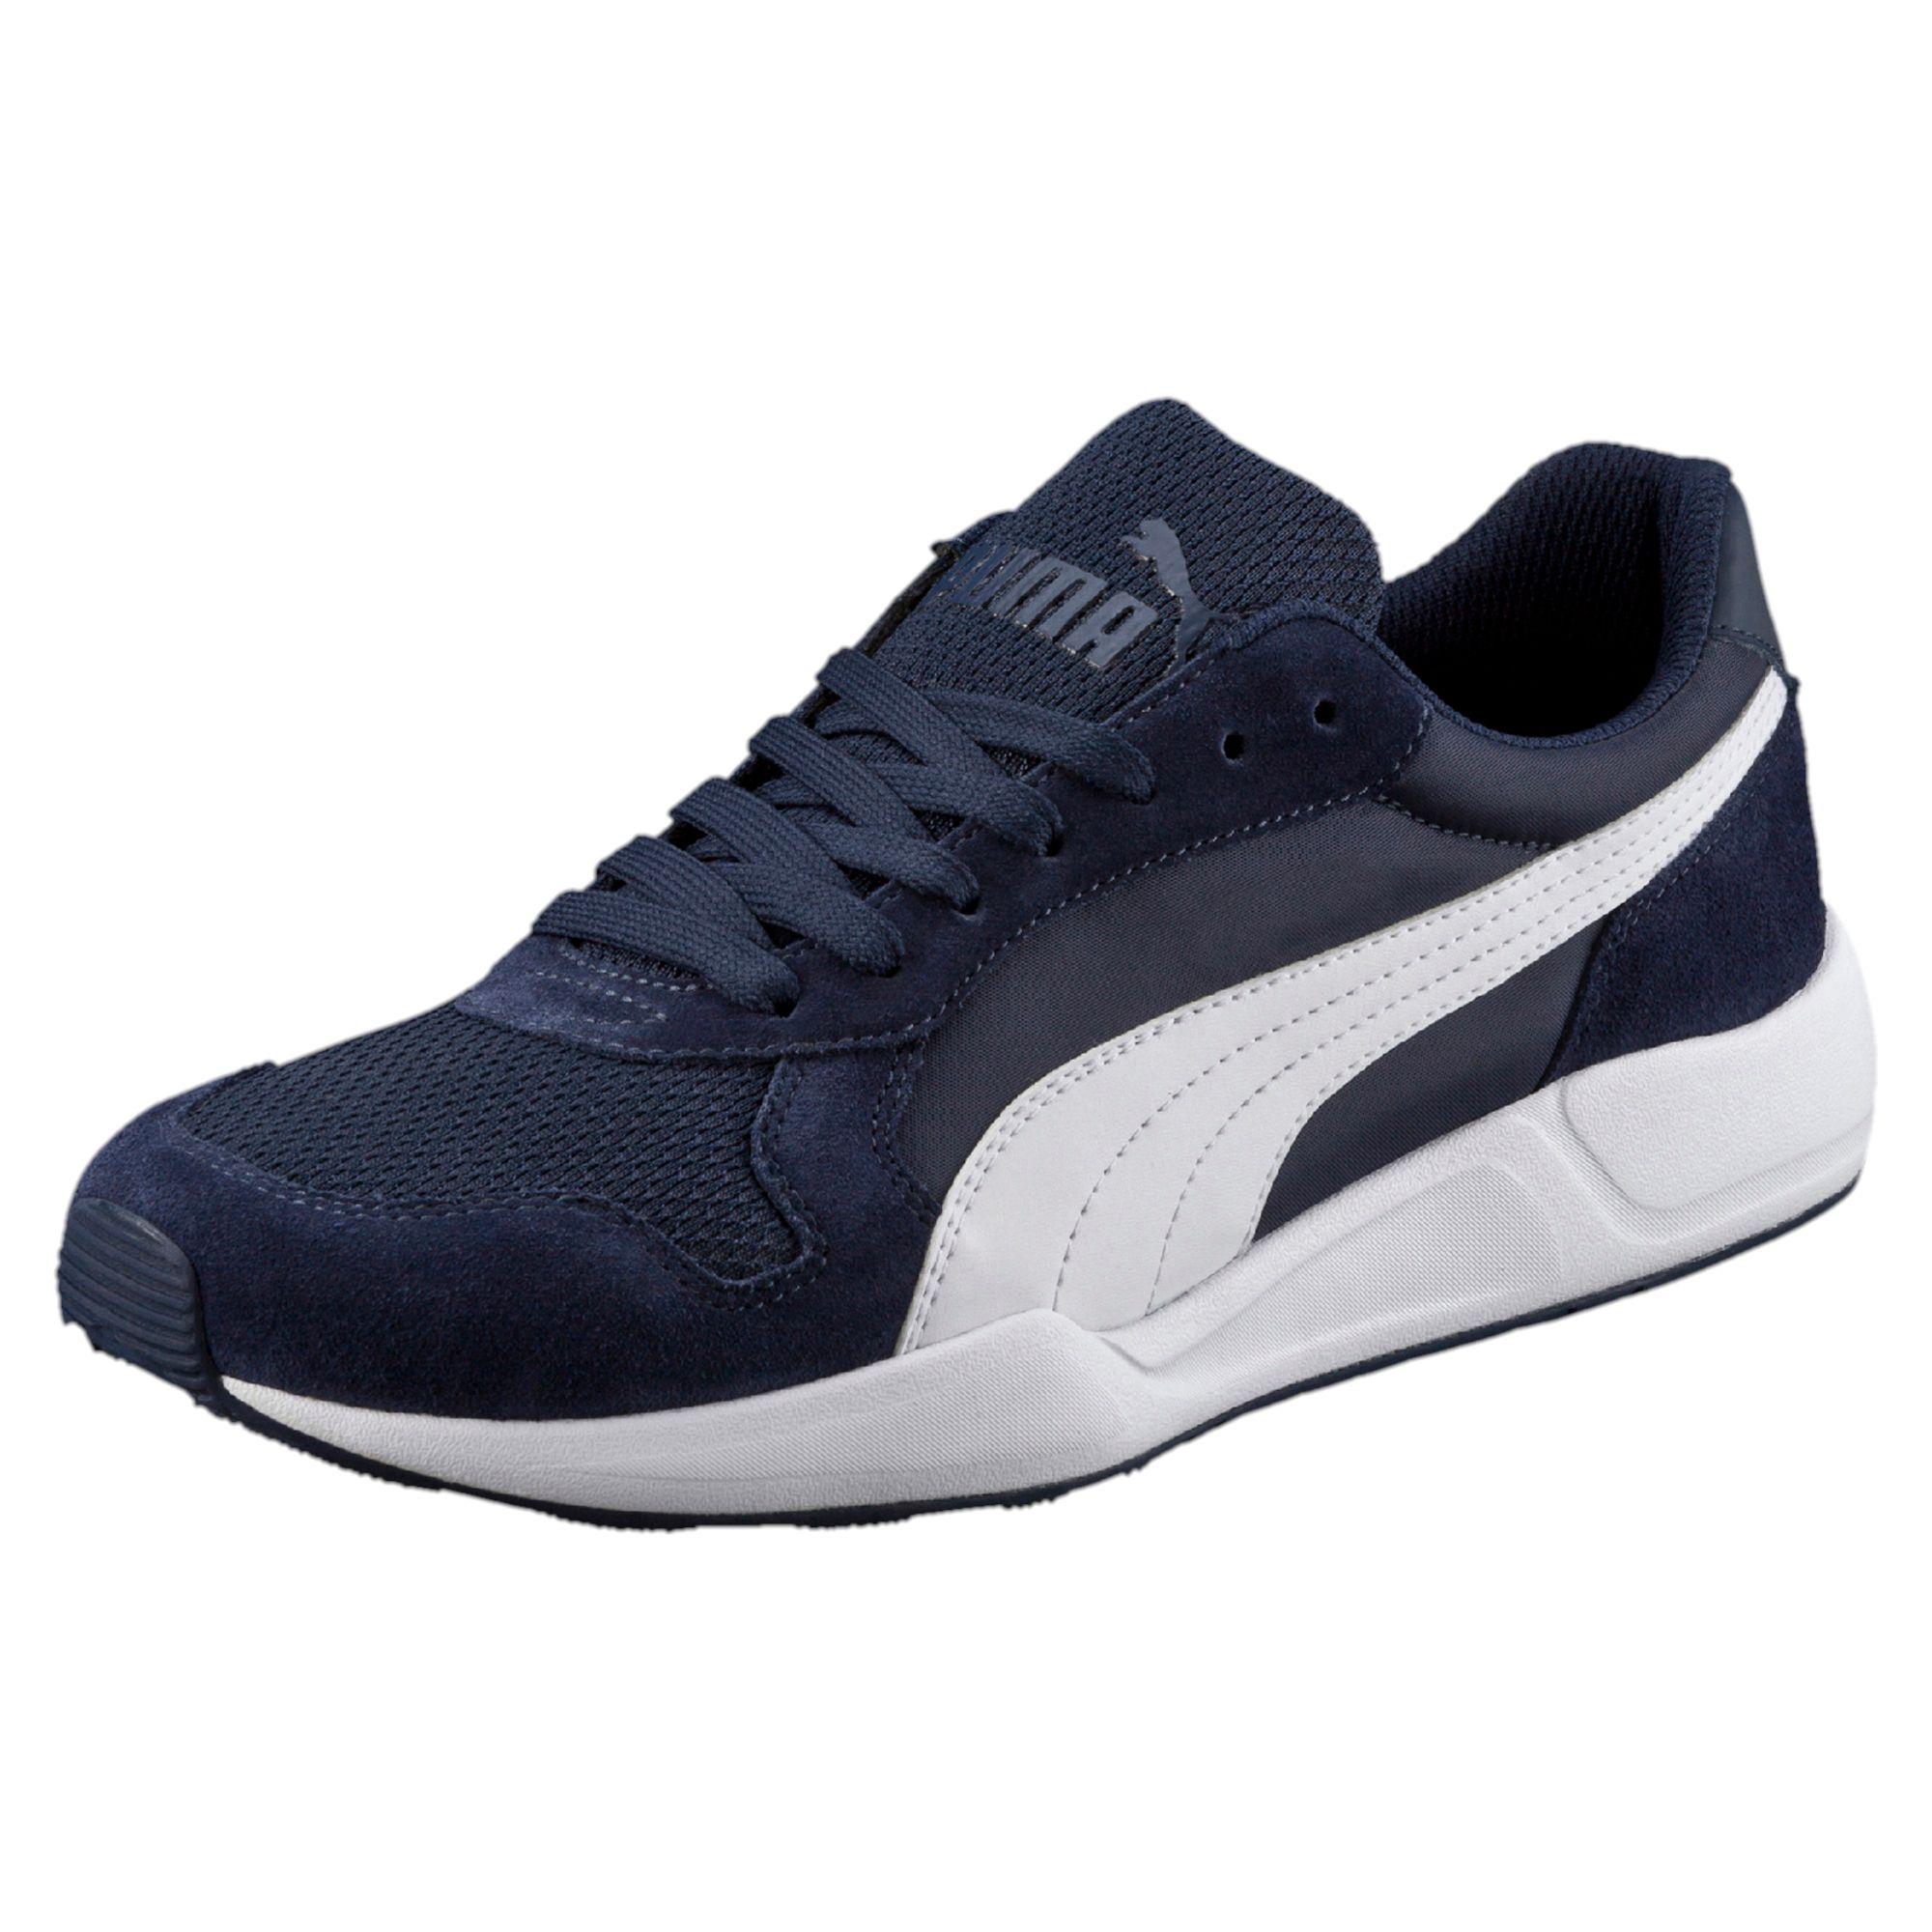 Diadora Game P Nero Bianco Scarpe Shoes Uomo Sportive Sneakers 80013 ... 5063882f853